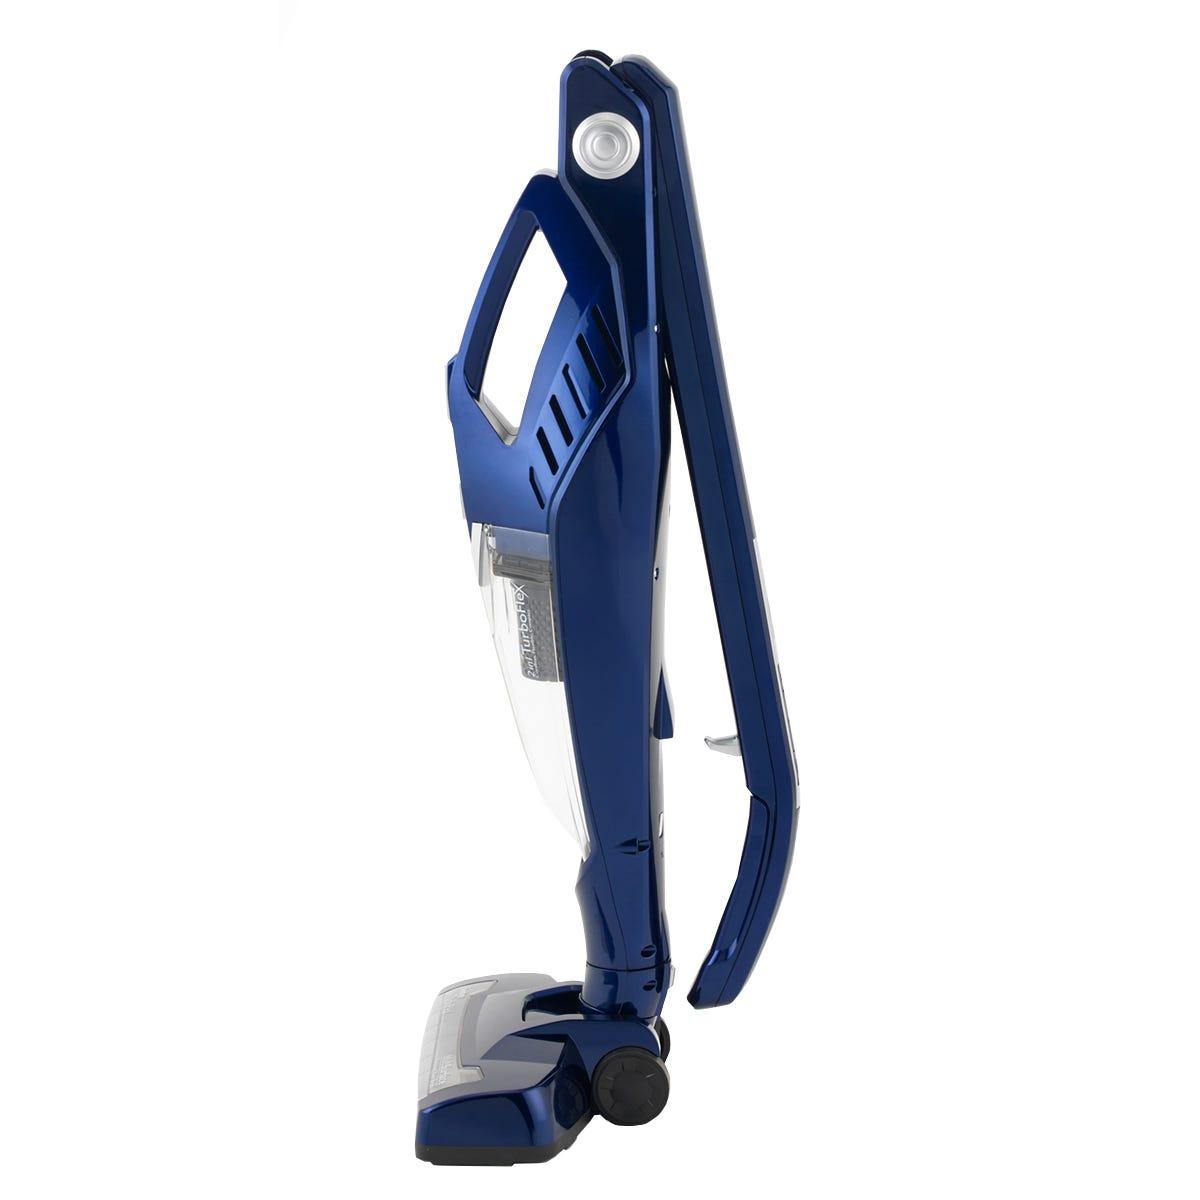 Image of Beldray BEL0738 2-in-1 Turbo Flex Cordless Vacuum Cleaner - Blue